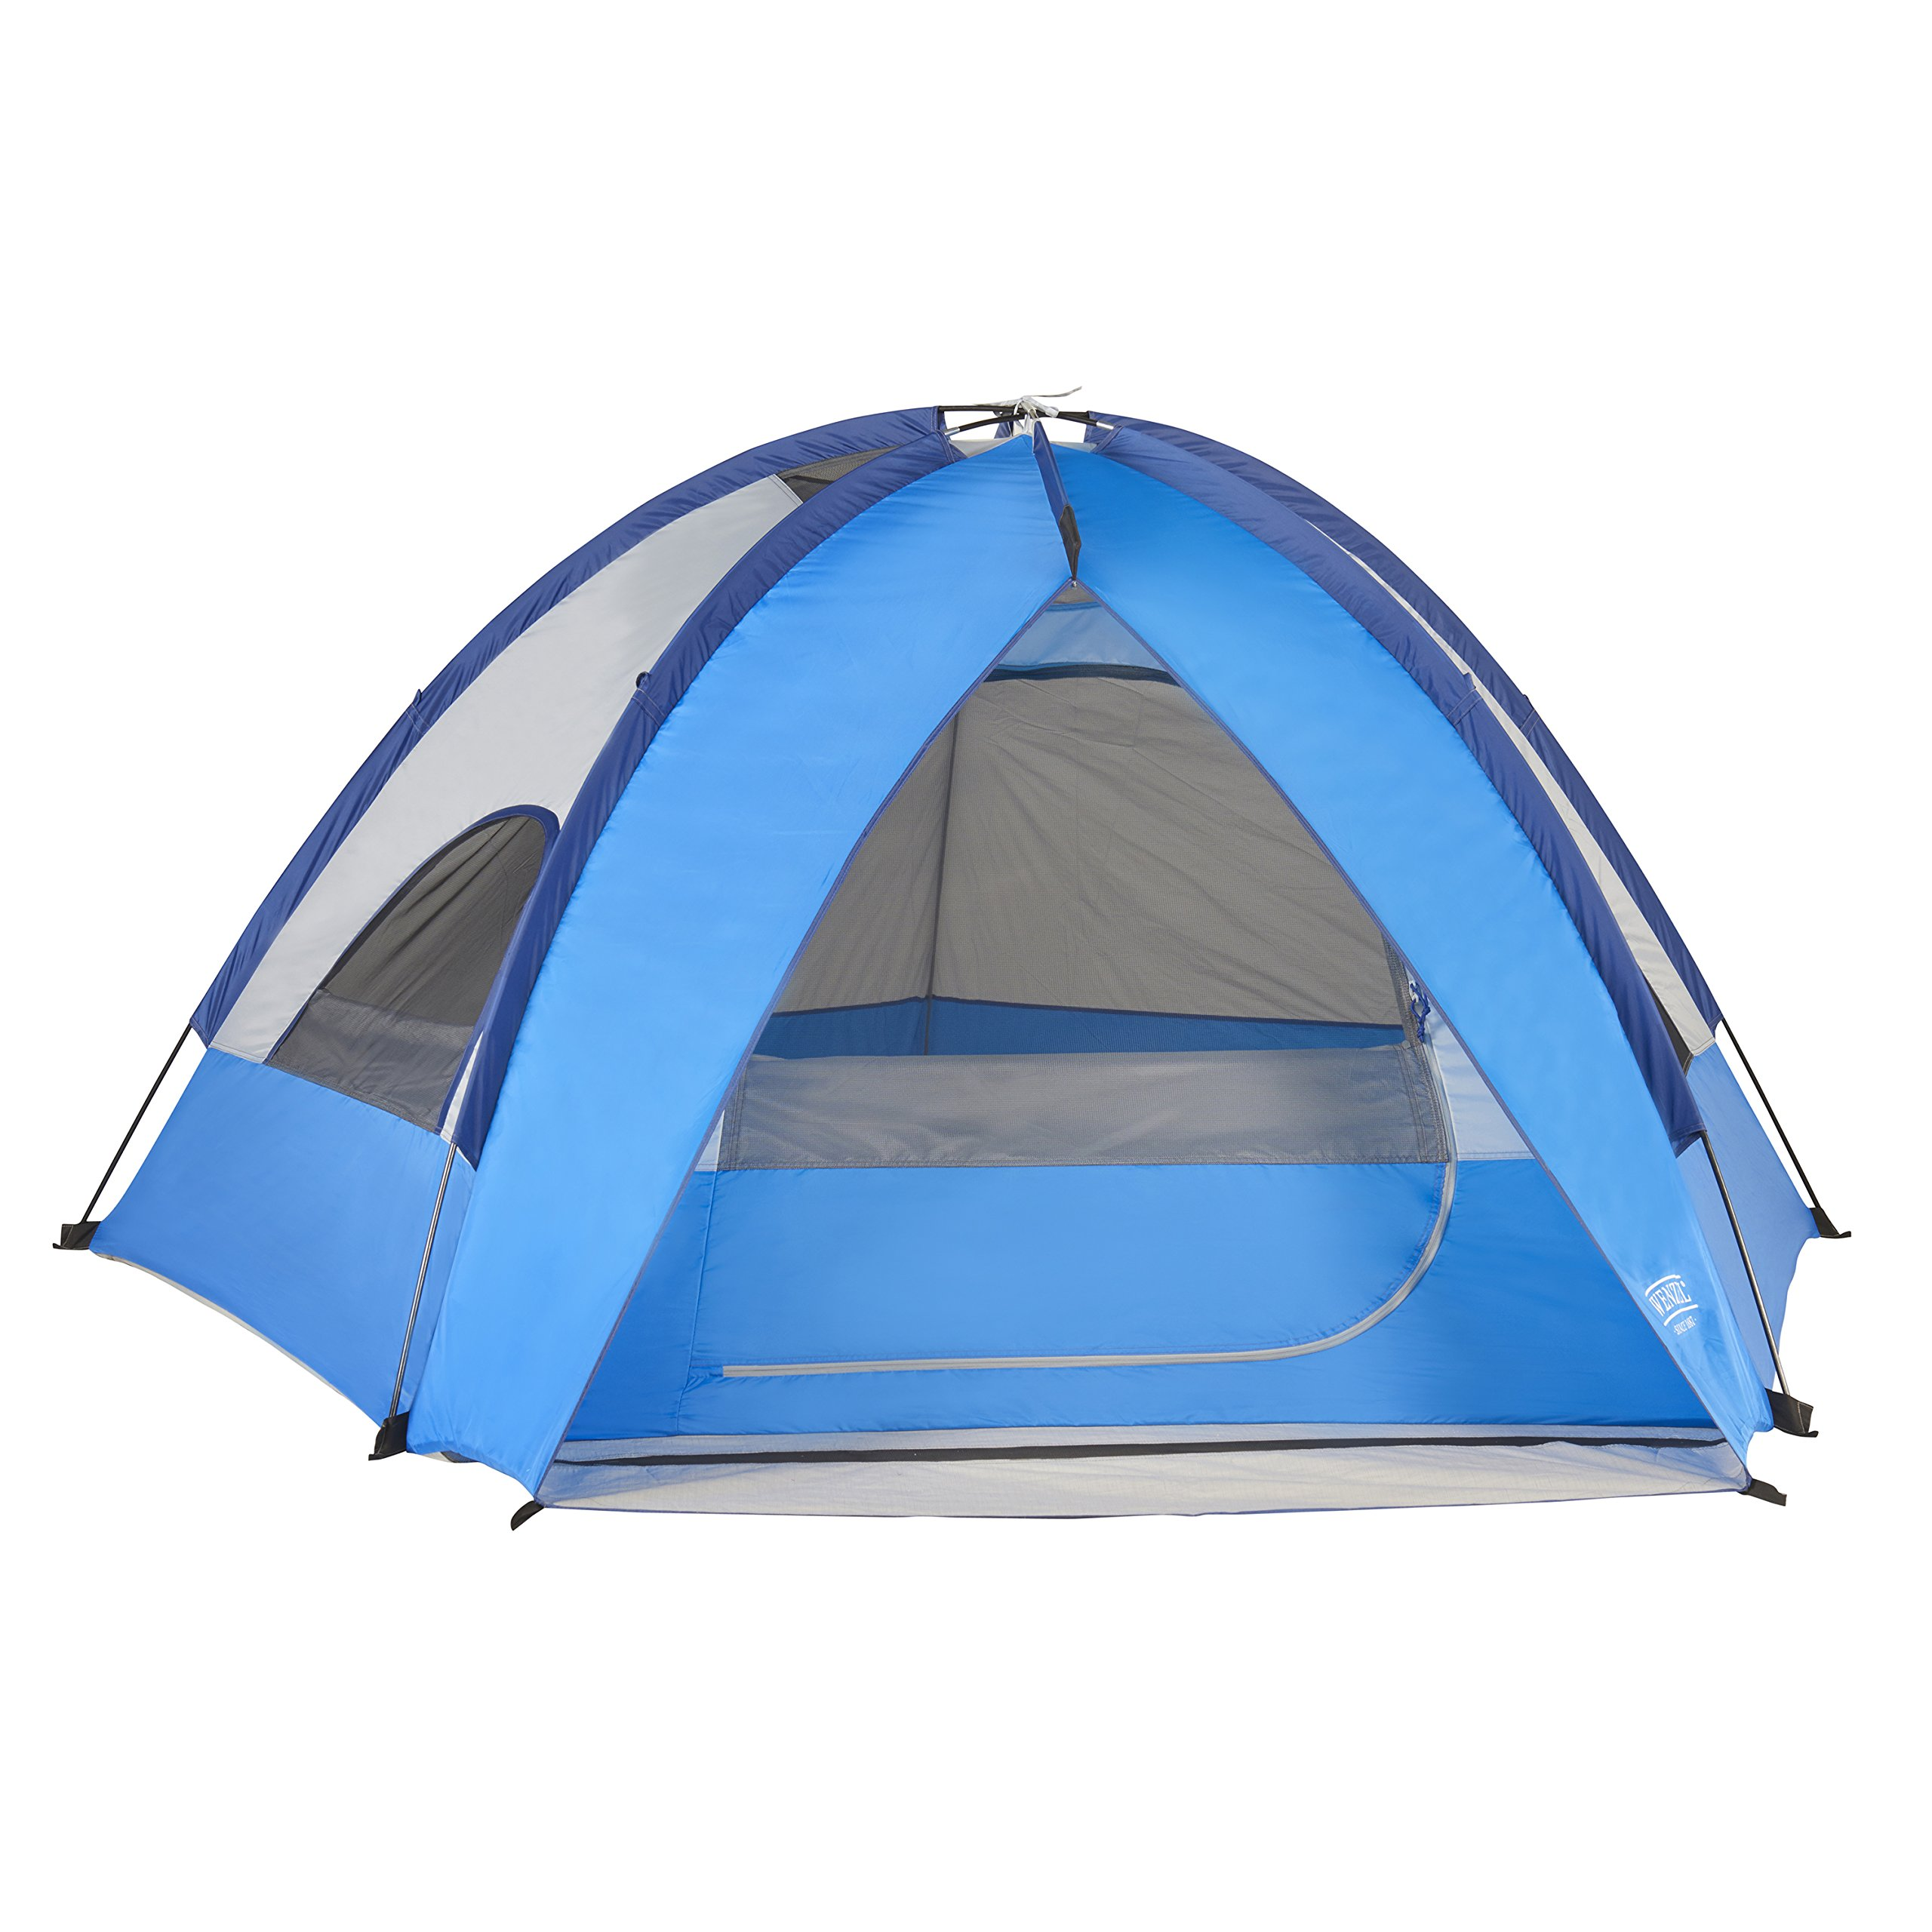 Wenzel Alpine 3 Person Tent, Blue by Wenzel